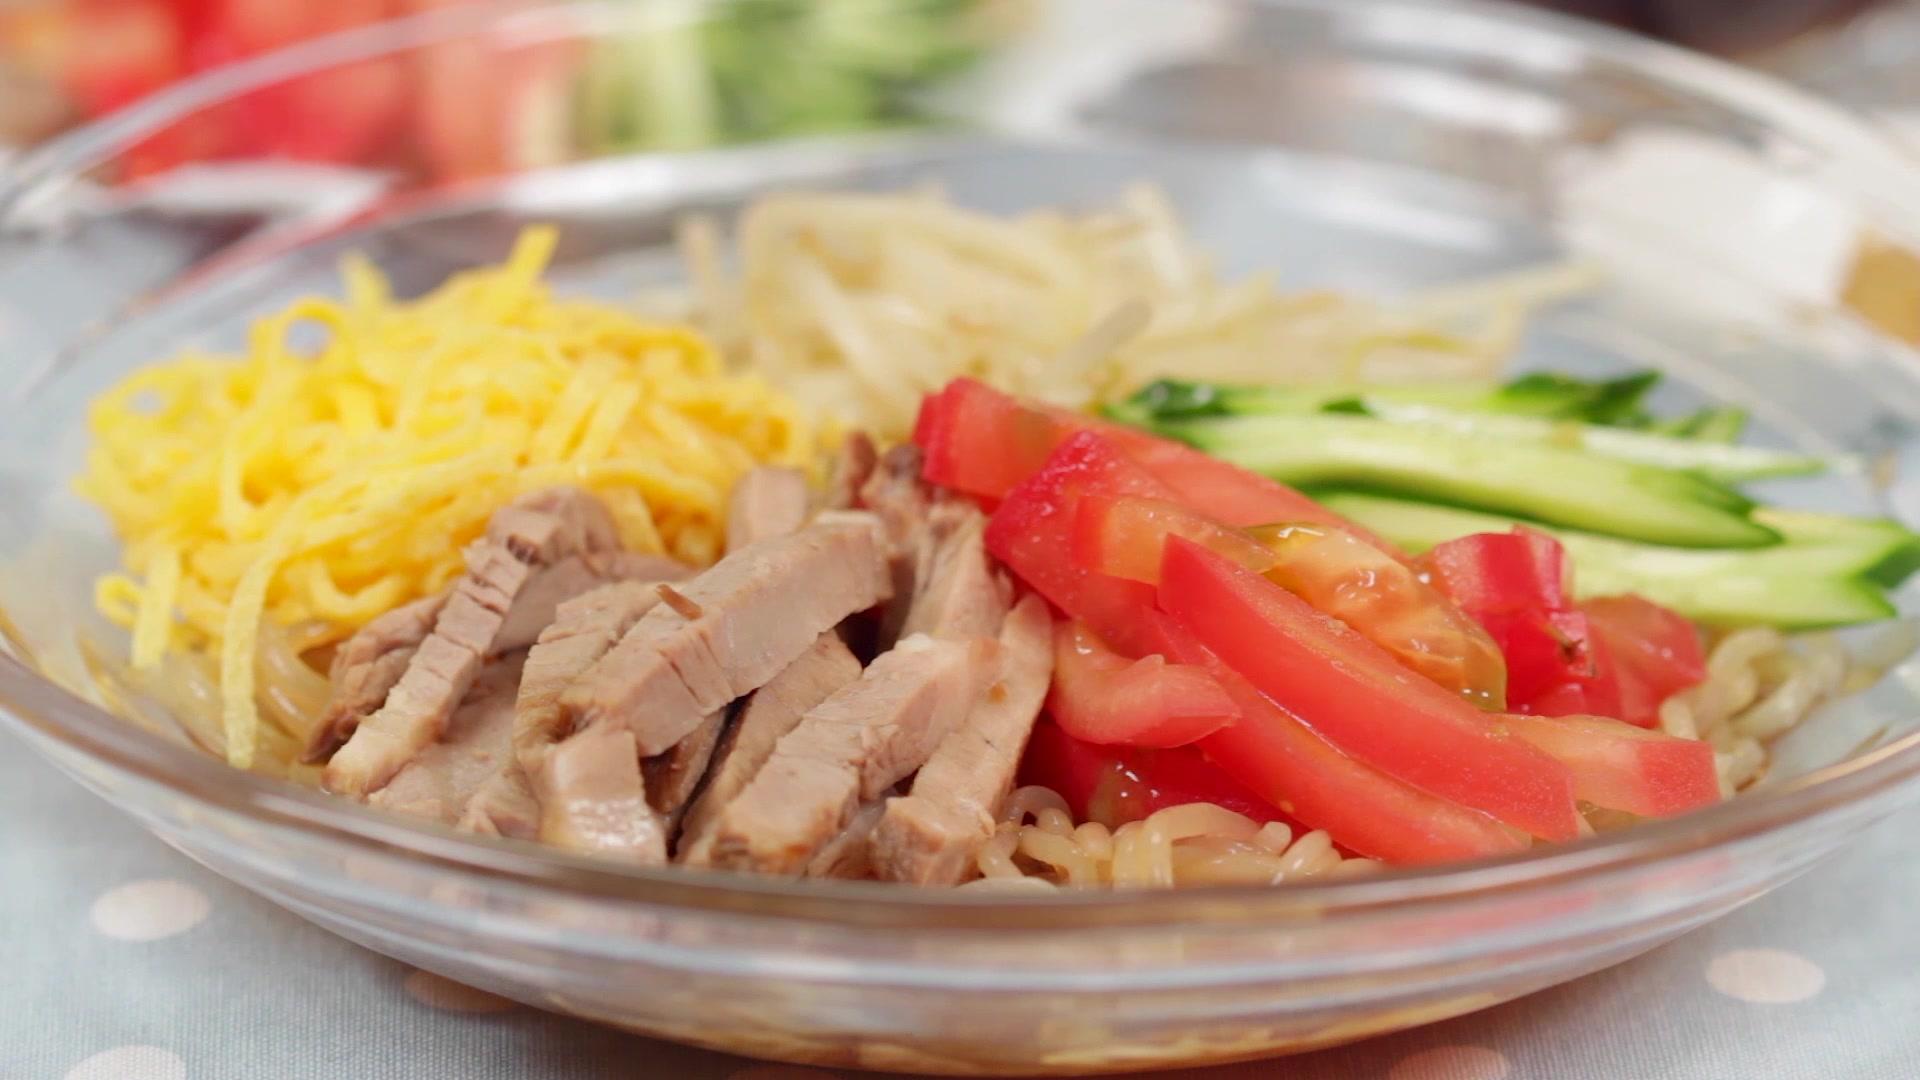 How to Make Low Calorie Hiyashi Chūka with Shirataki Noodles